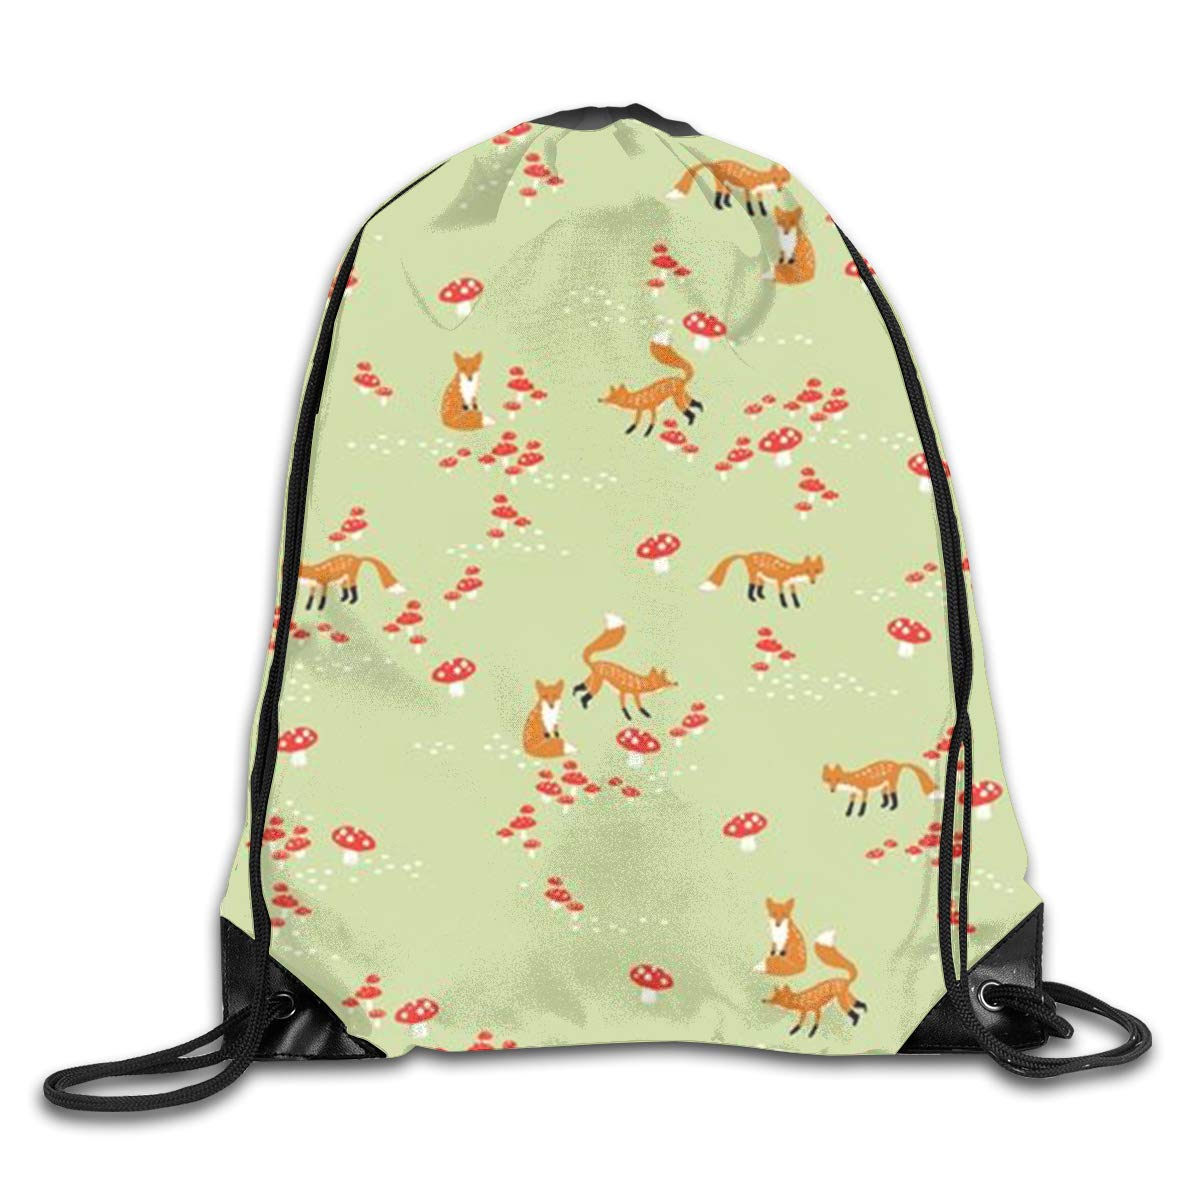 f7e87005a2 Amazon.com  Tfugpigp Mushrooms and Cute Fox Drawstring Backpacks Sport  Leisure Bundle Backpack Beam Backpack Sport Gym Travelling Bag  Home    Kitchen